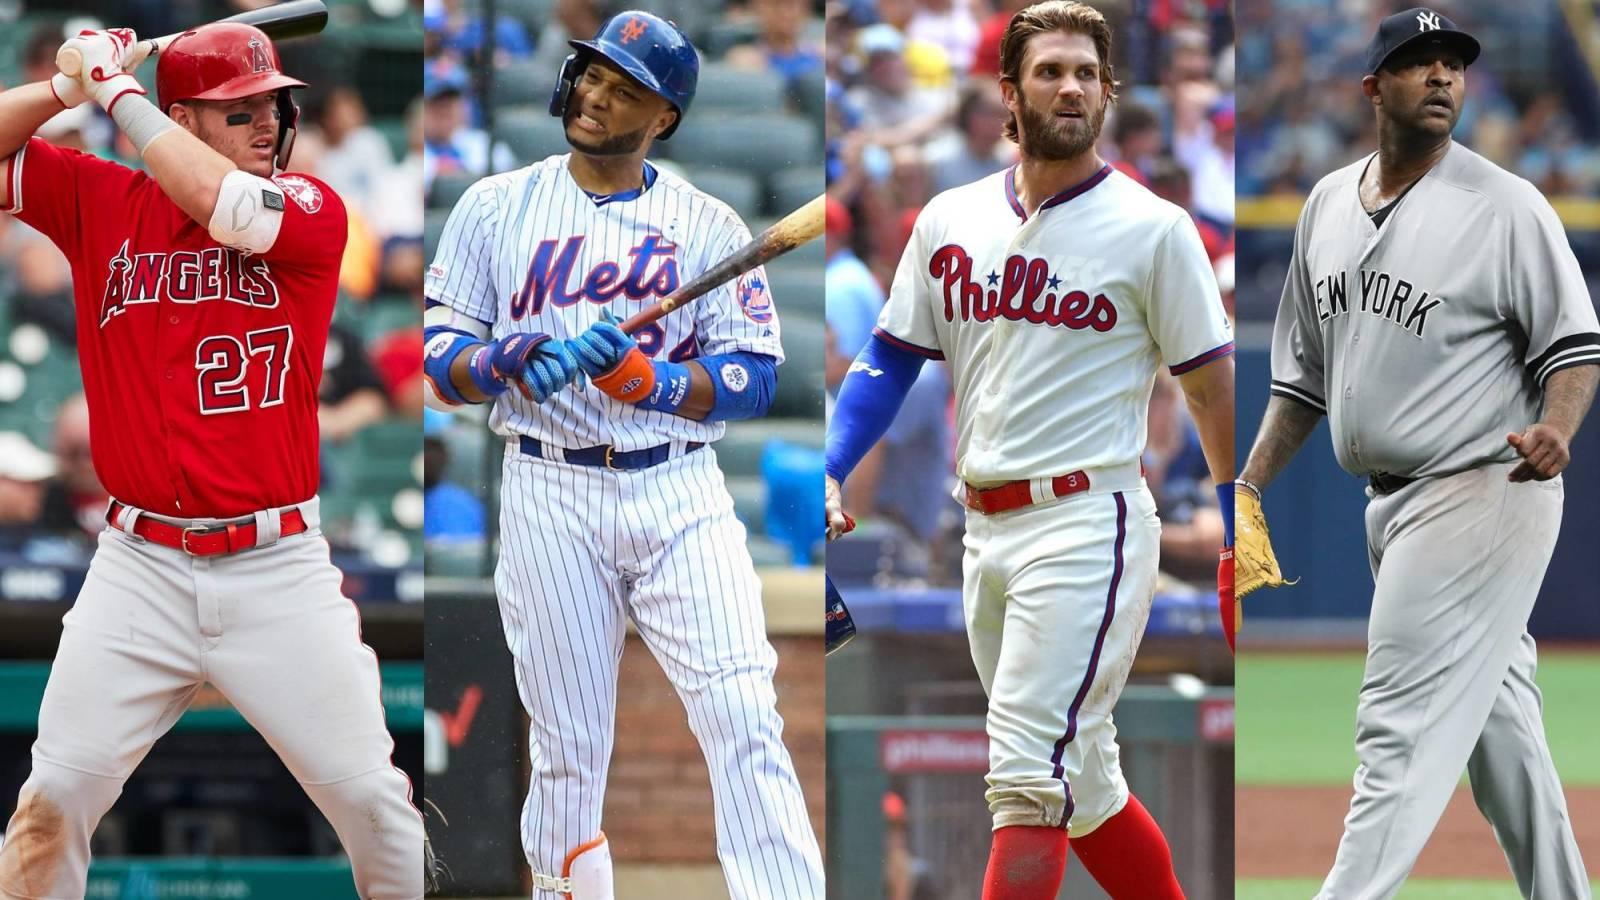 Yardbarker's Ultimate MLB Hall of Fame tiers